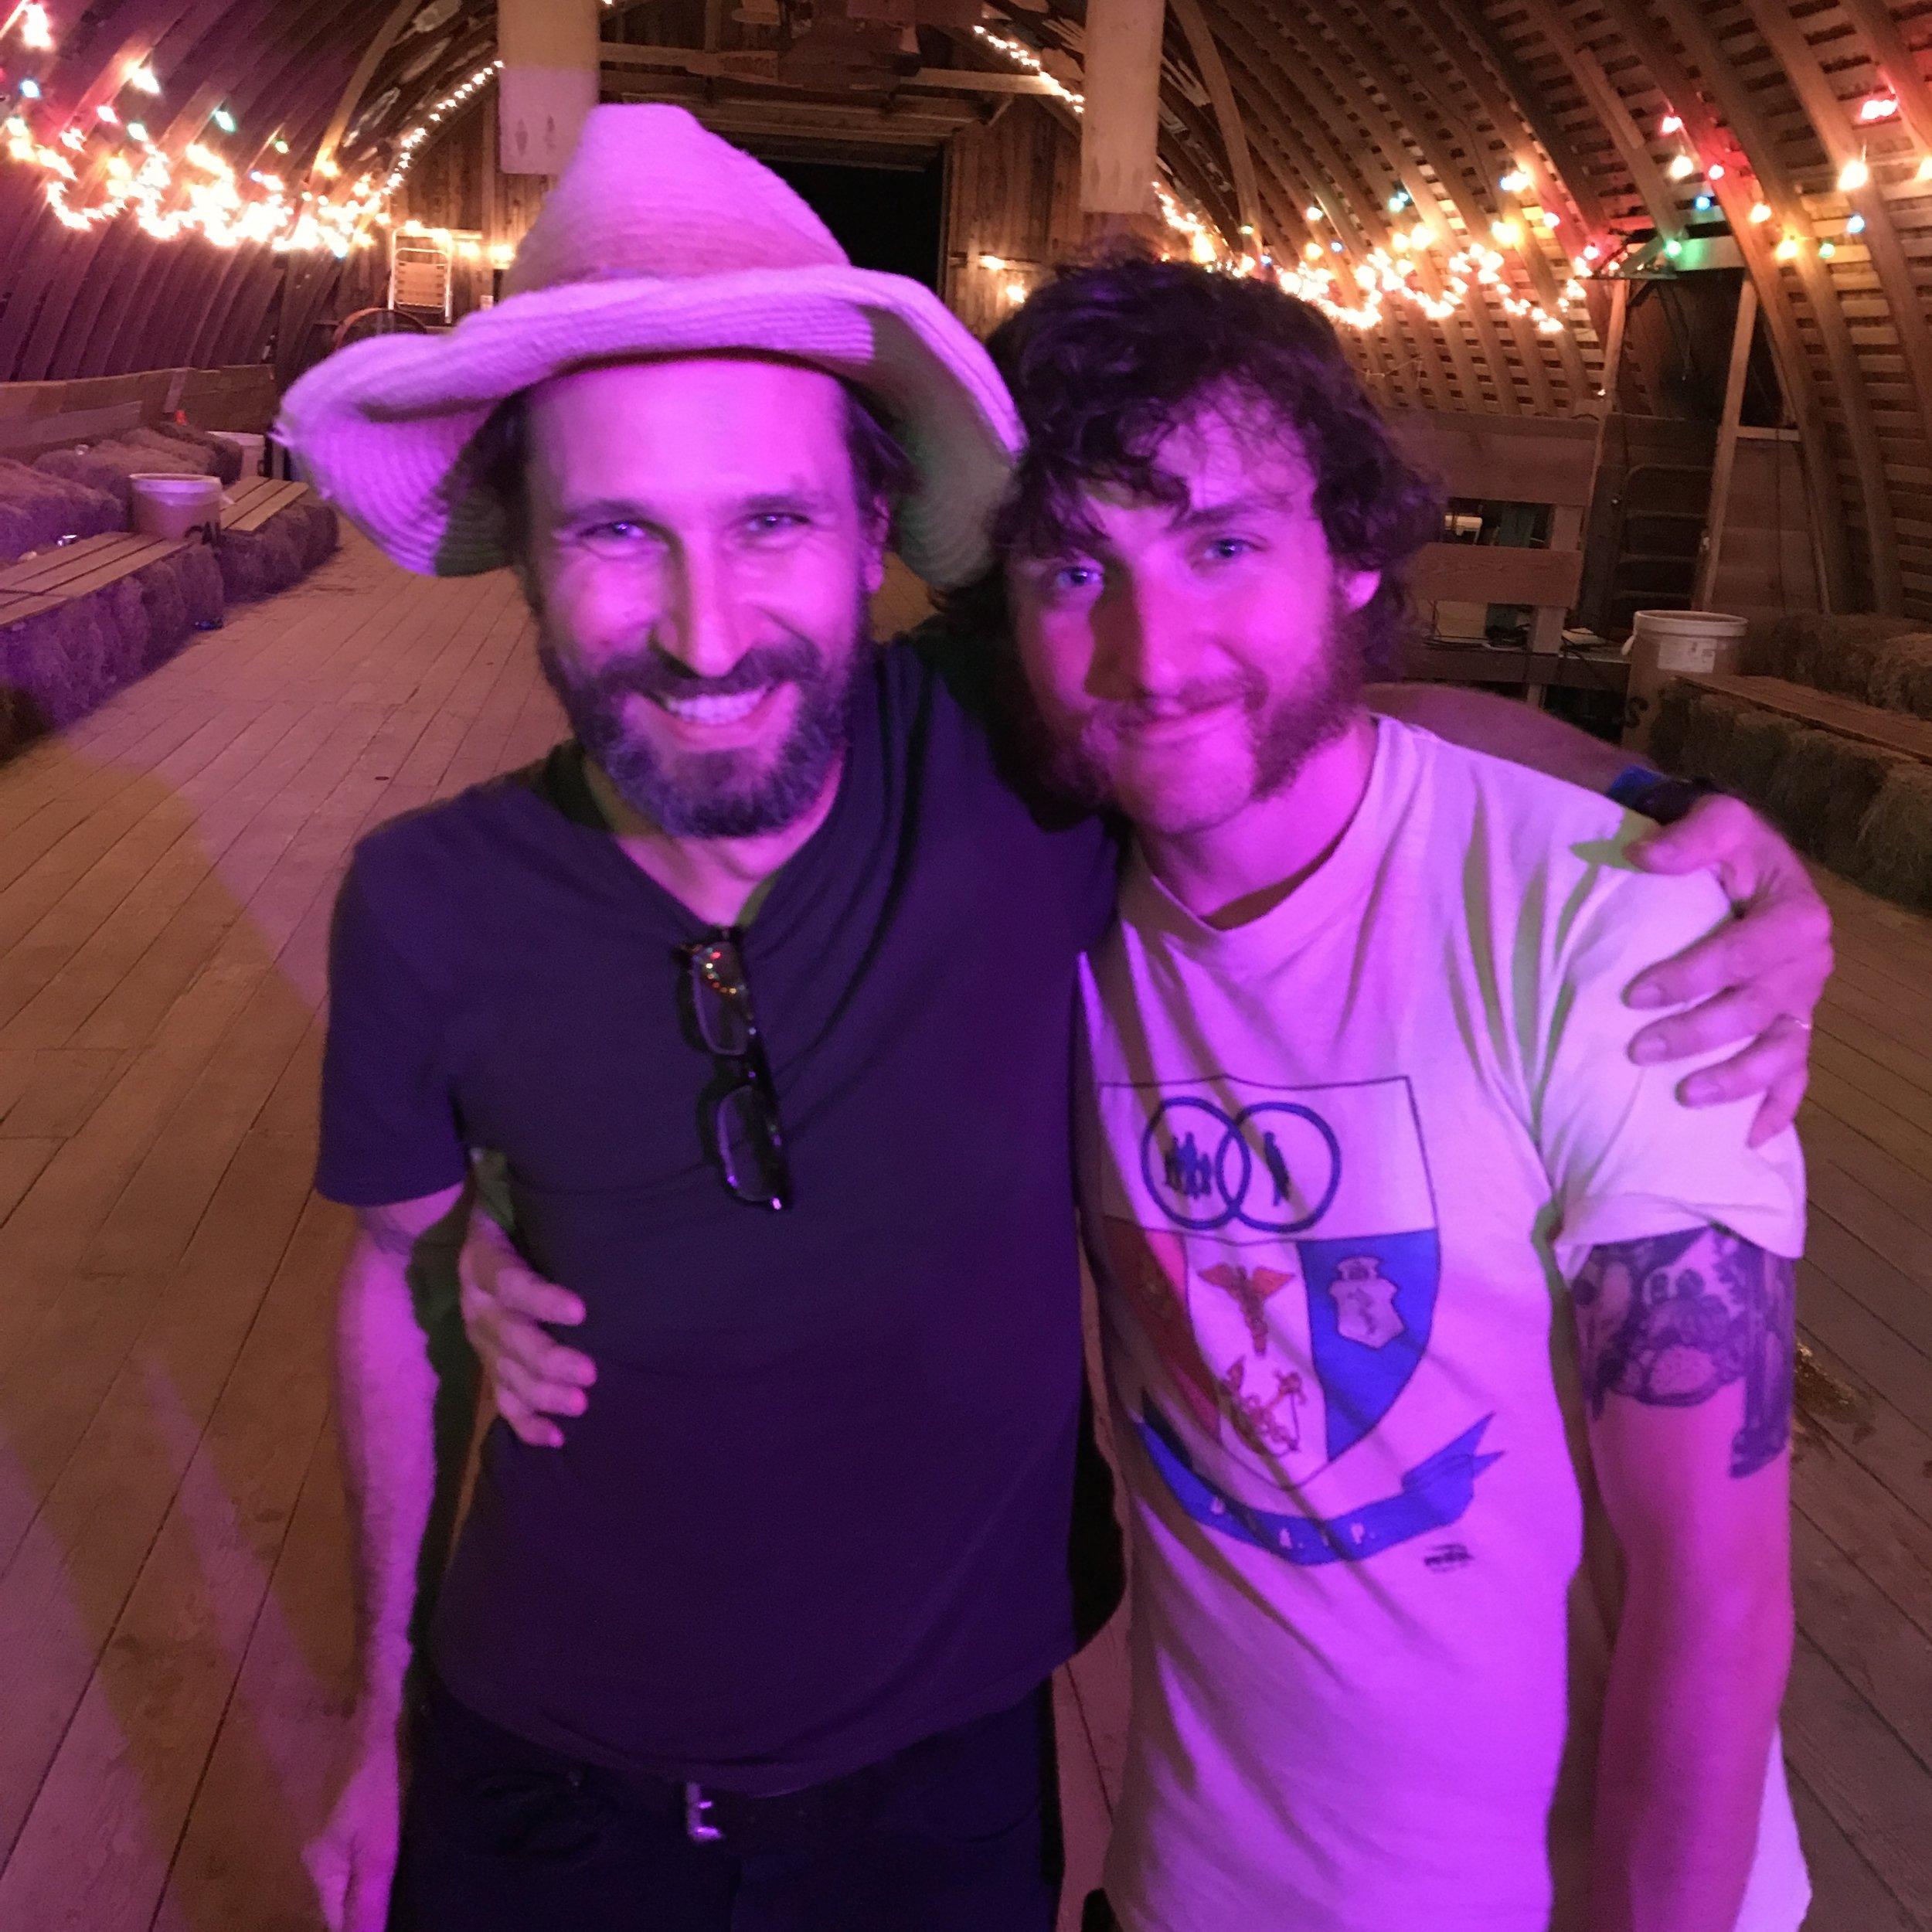 Will Johnson with John Calvin Abney. June 17, 2017 at Codfish Hollow Barnstormers.